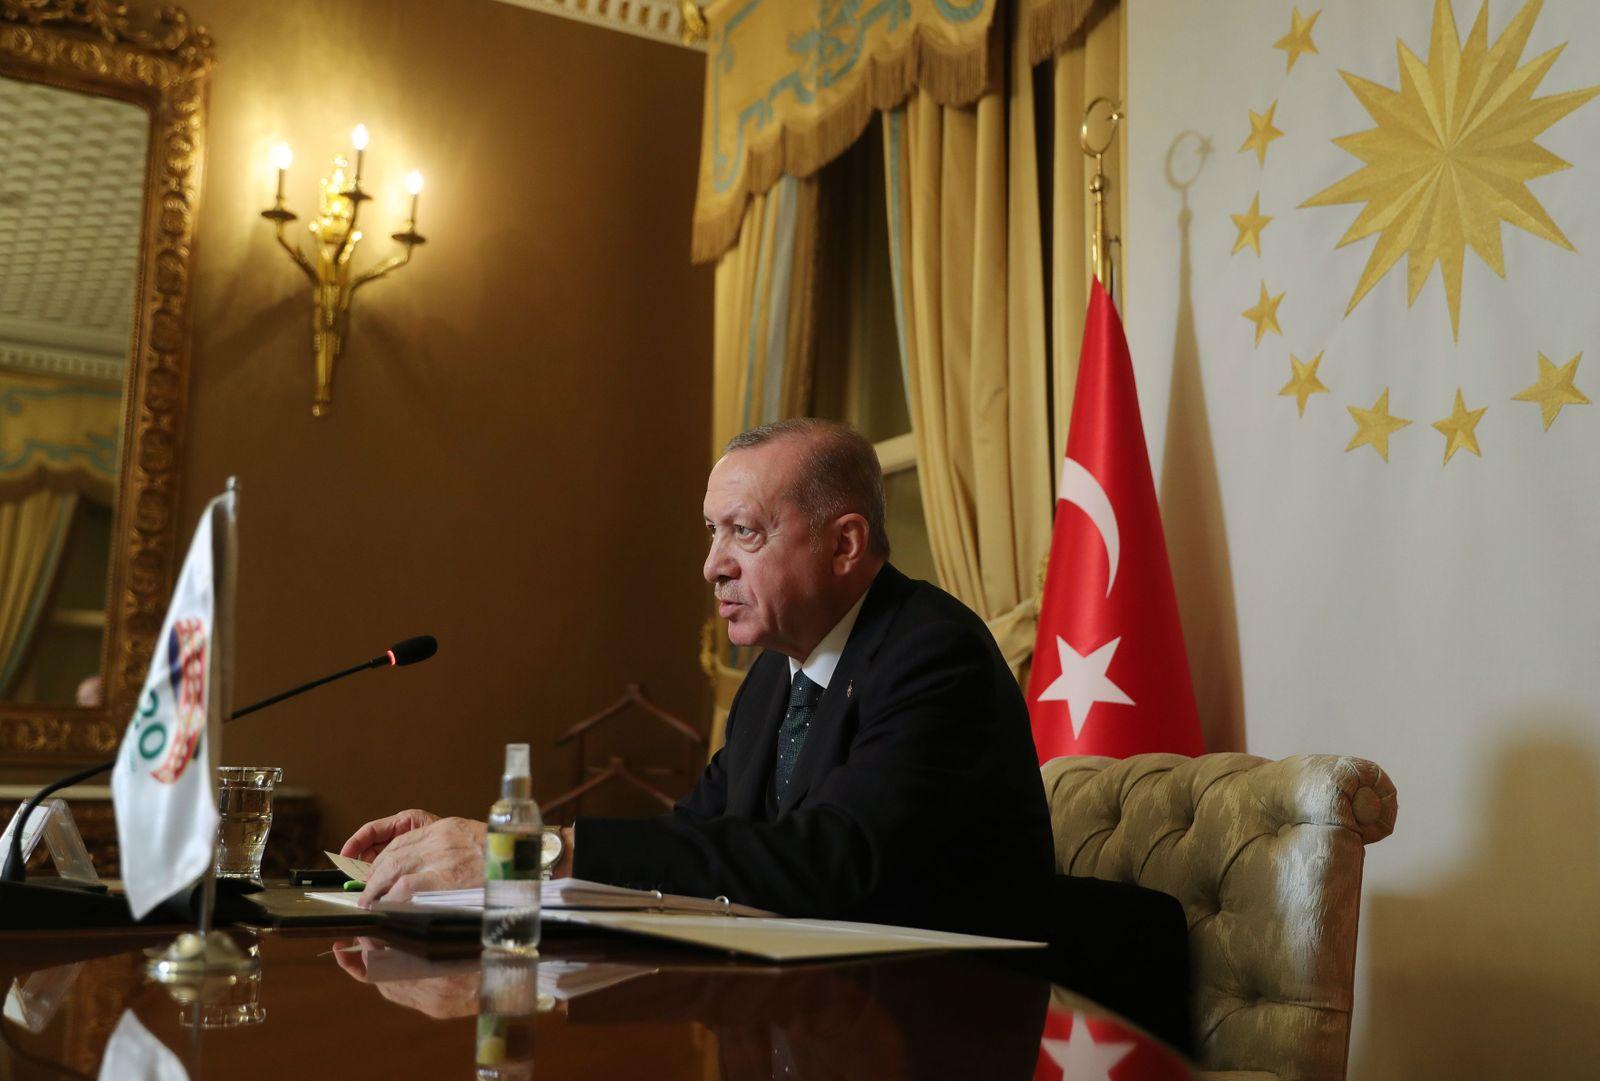 Turkish President Erdogan takes part in the virtual G20 meeting hosted by Saudi Arabia, in Istanbul, Turkey - 22 Nov 2020